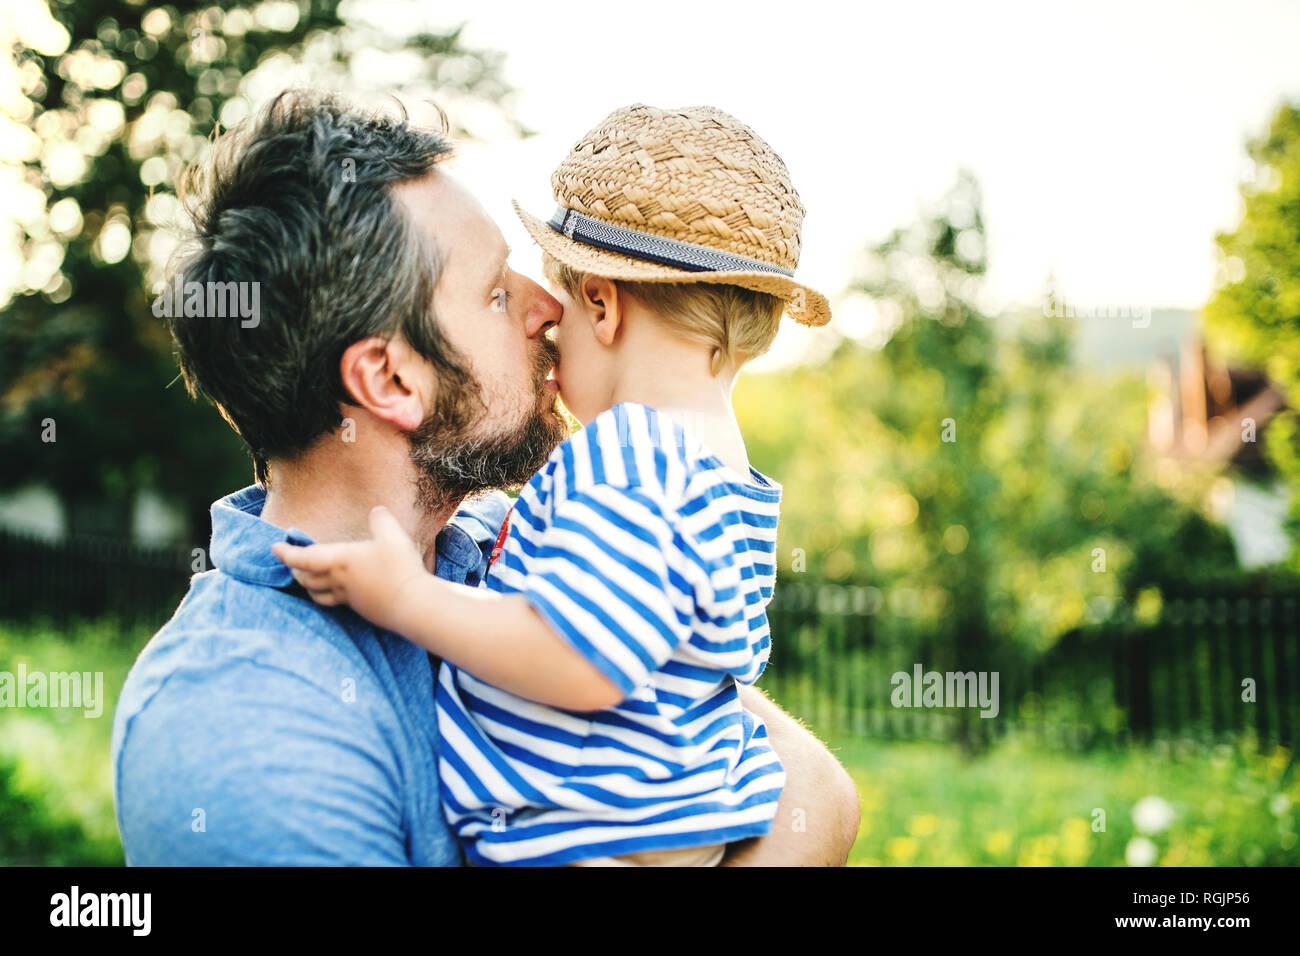 Vater seinen kleinen Sohn küssen Stockfoto